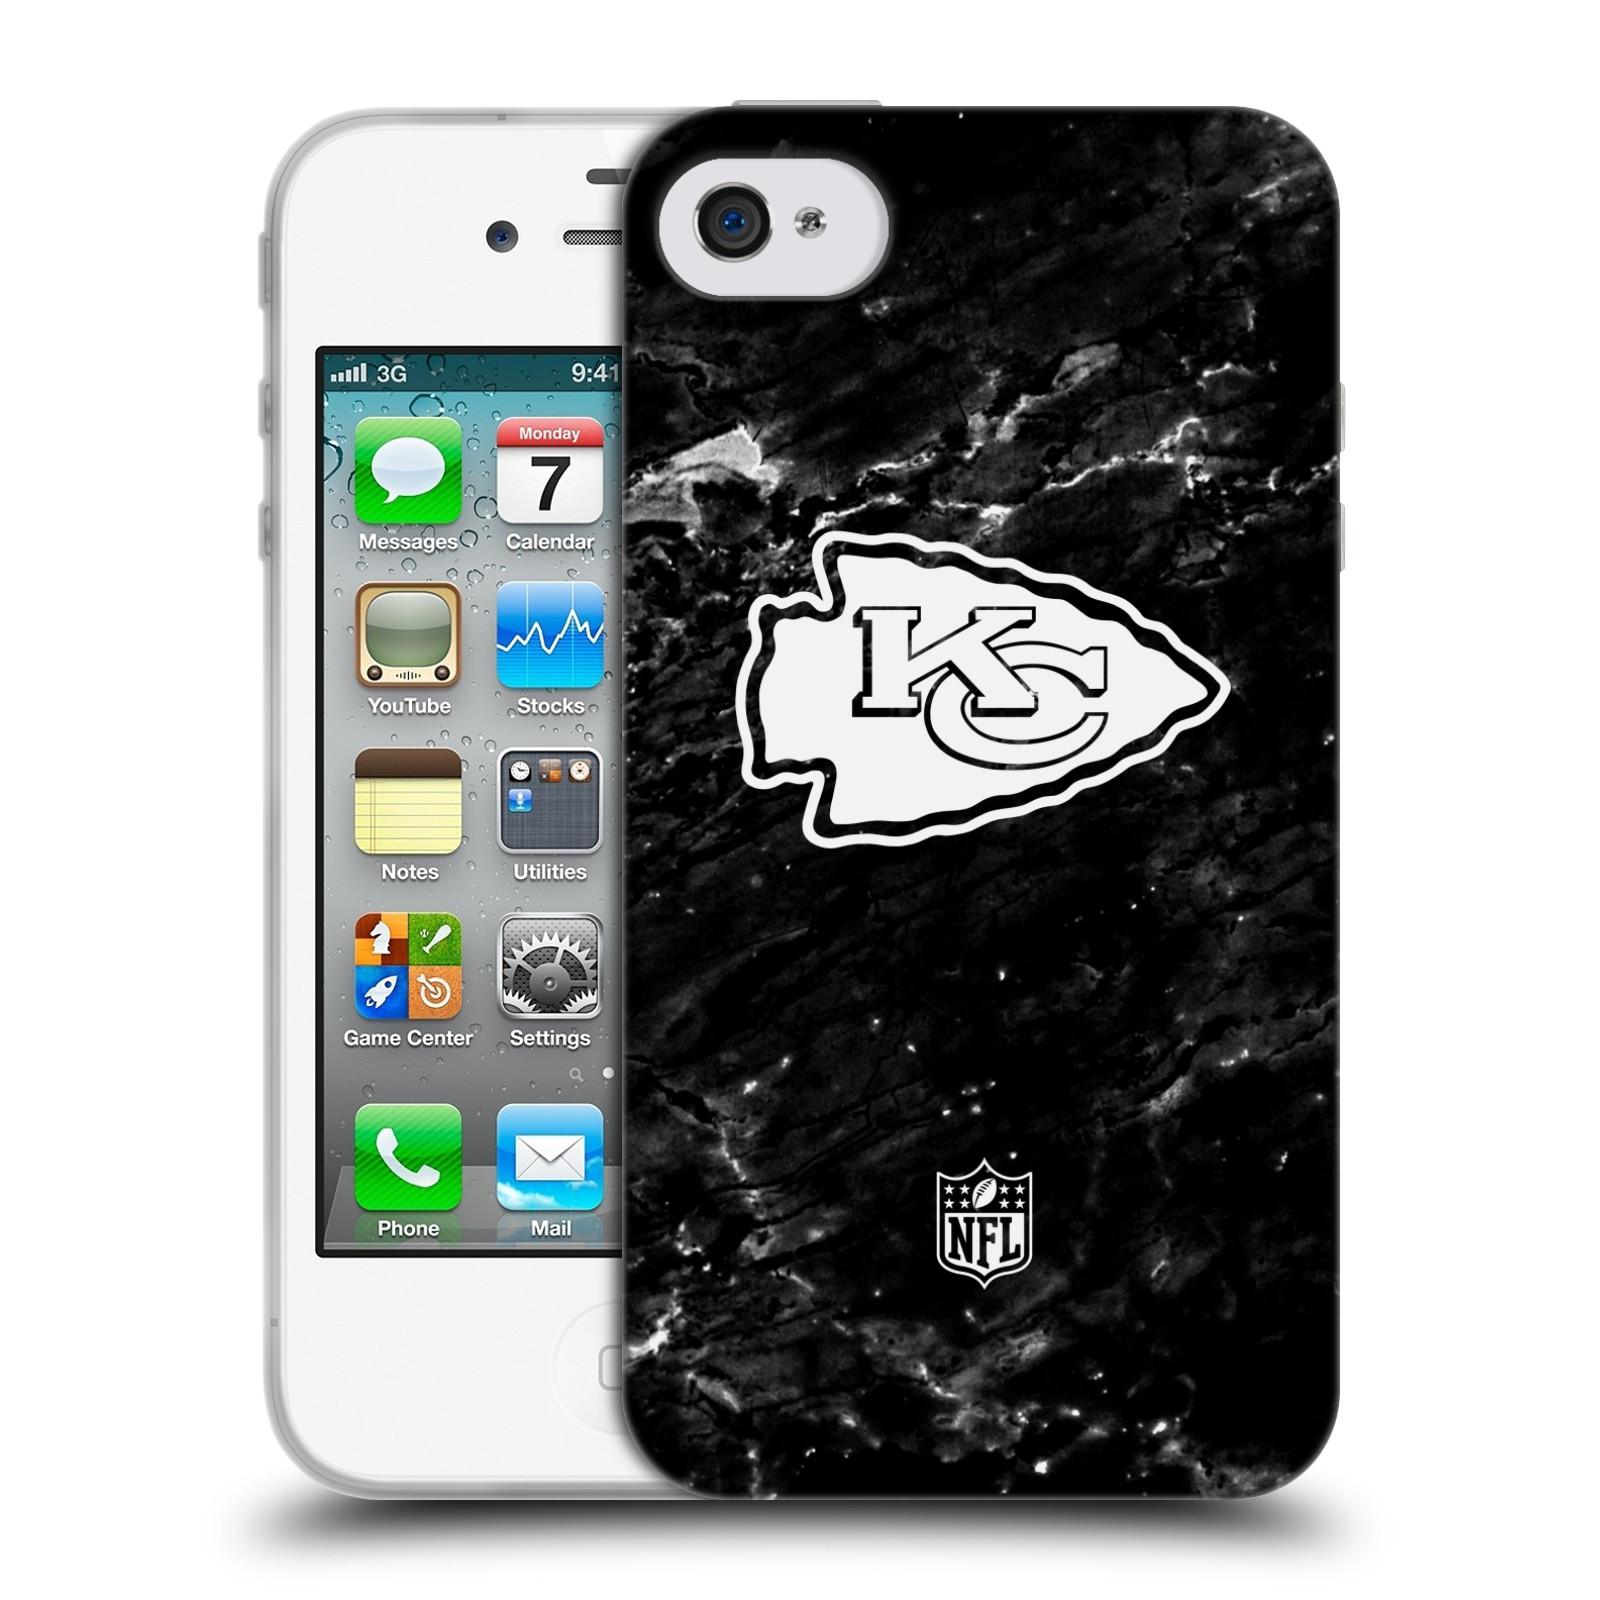 OFFICIAL NFL 2017/18 KANSAS CITY CHIEFS SOFT GEL CASE FOR APPLE IPHONE PHONES